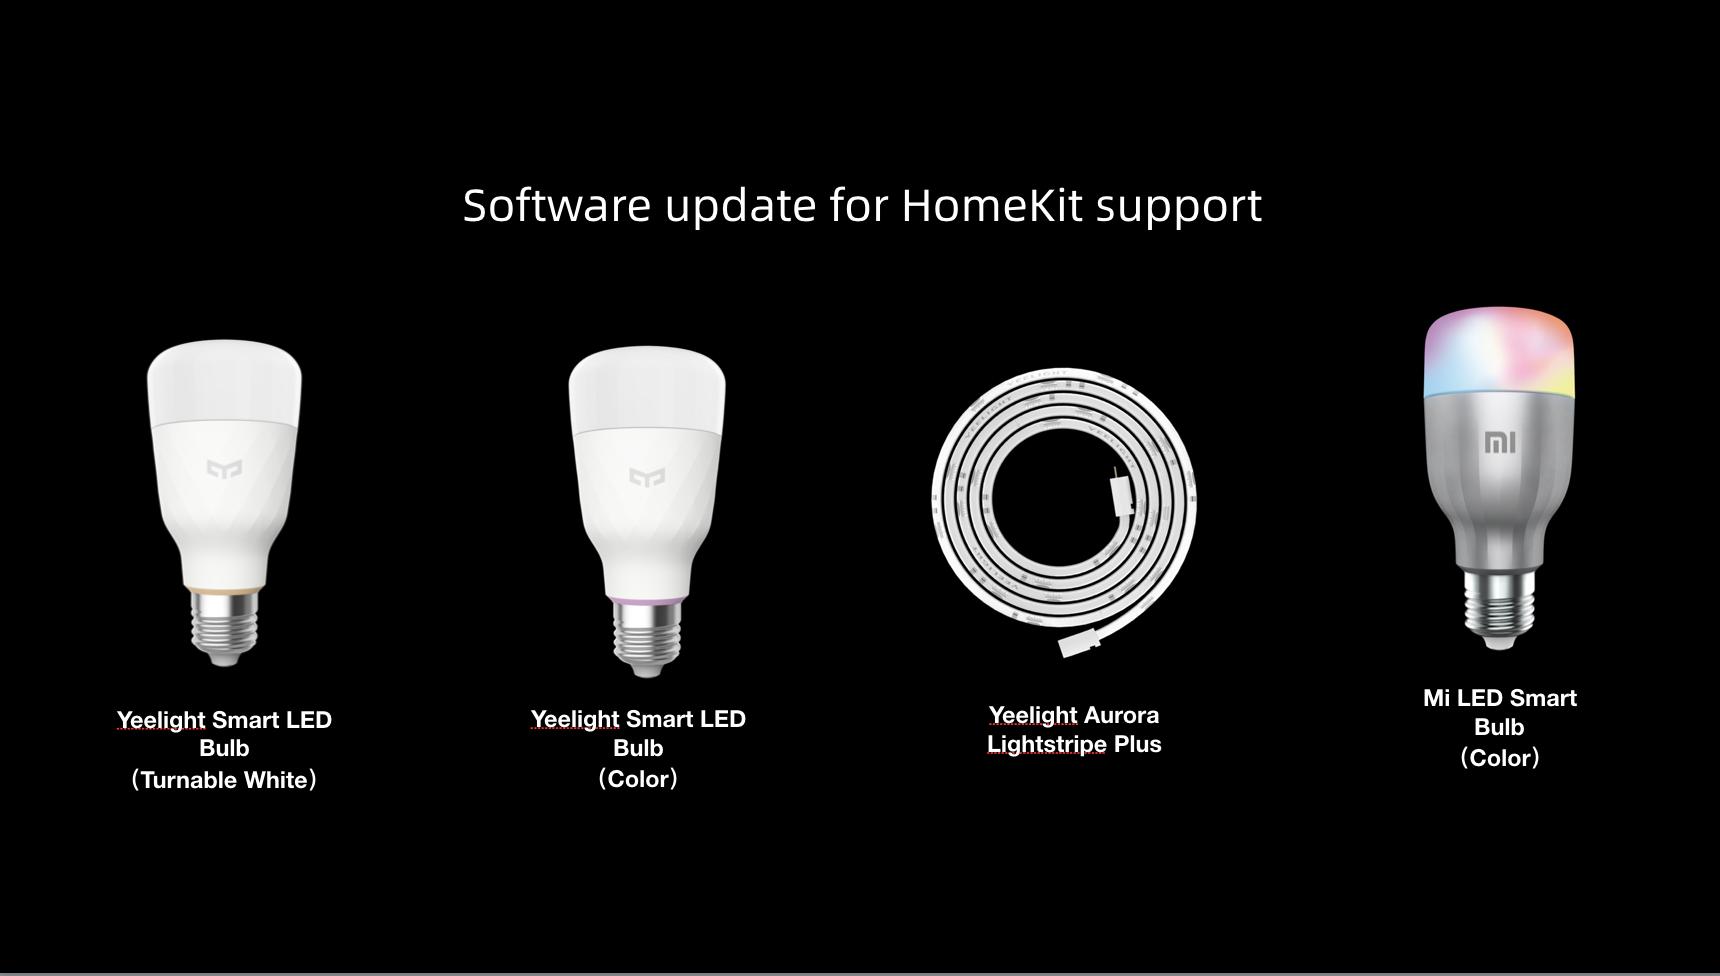 Yeelight Aurora Lightstrip and Yeelight Color Bulb Supporting HomeKit in Q3